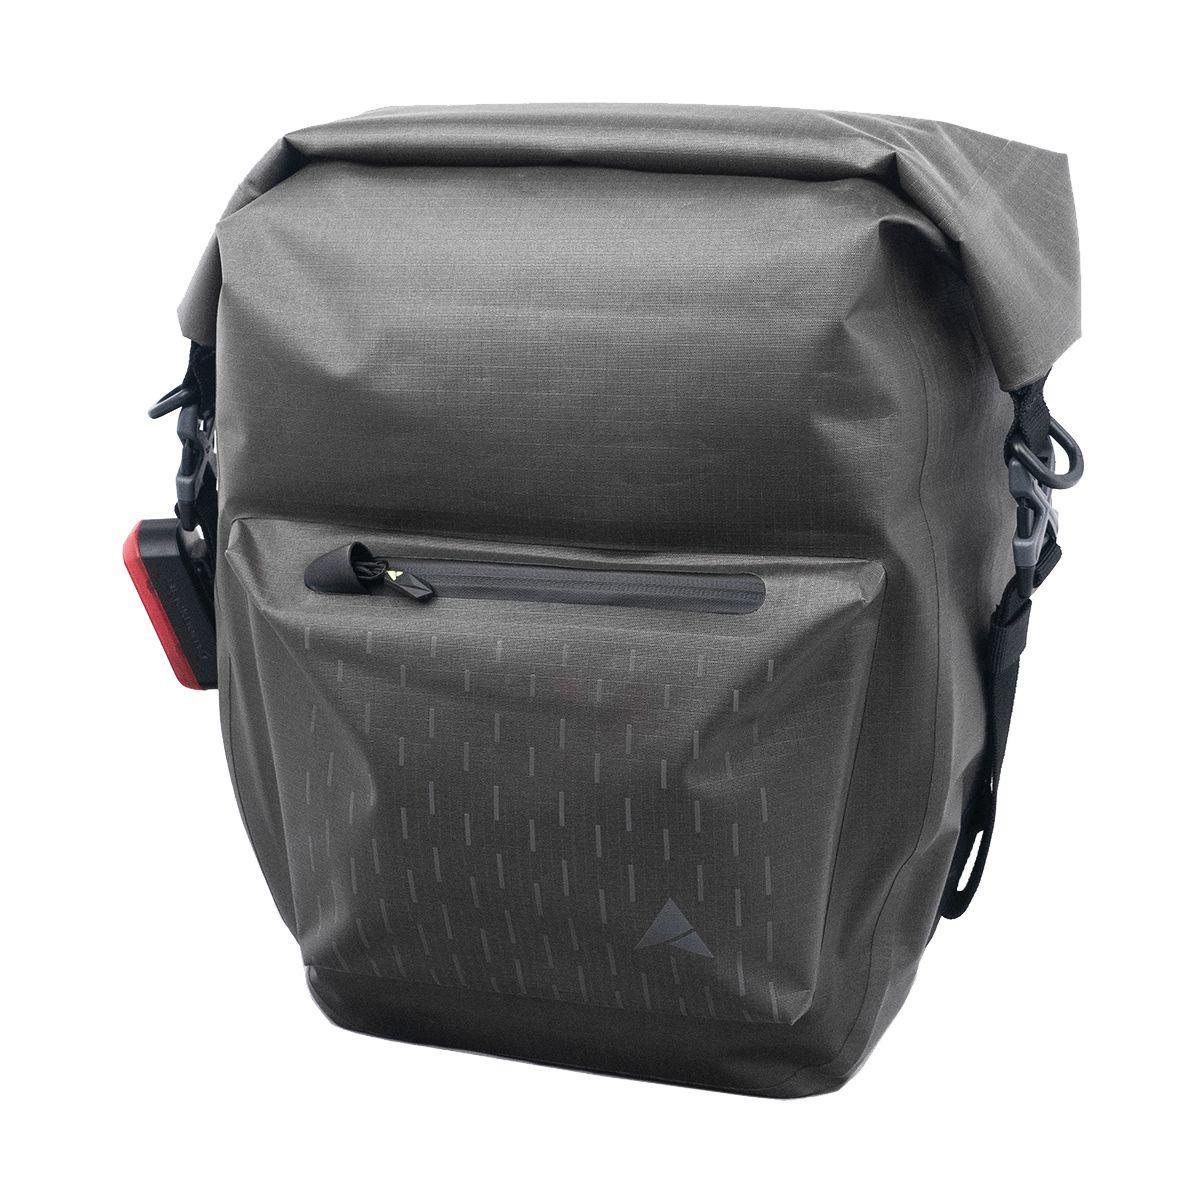 Altura - Thunderstorm Adventure | bike rack bag